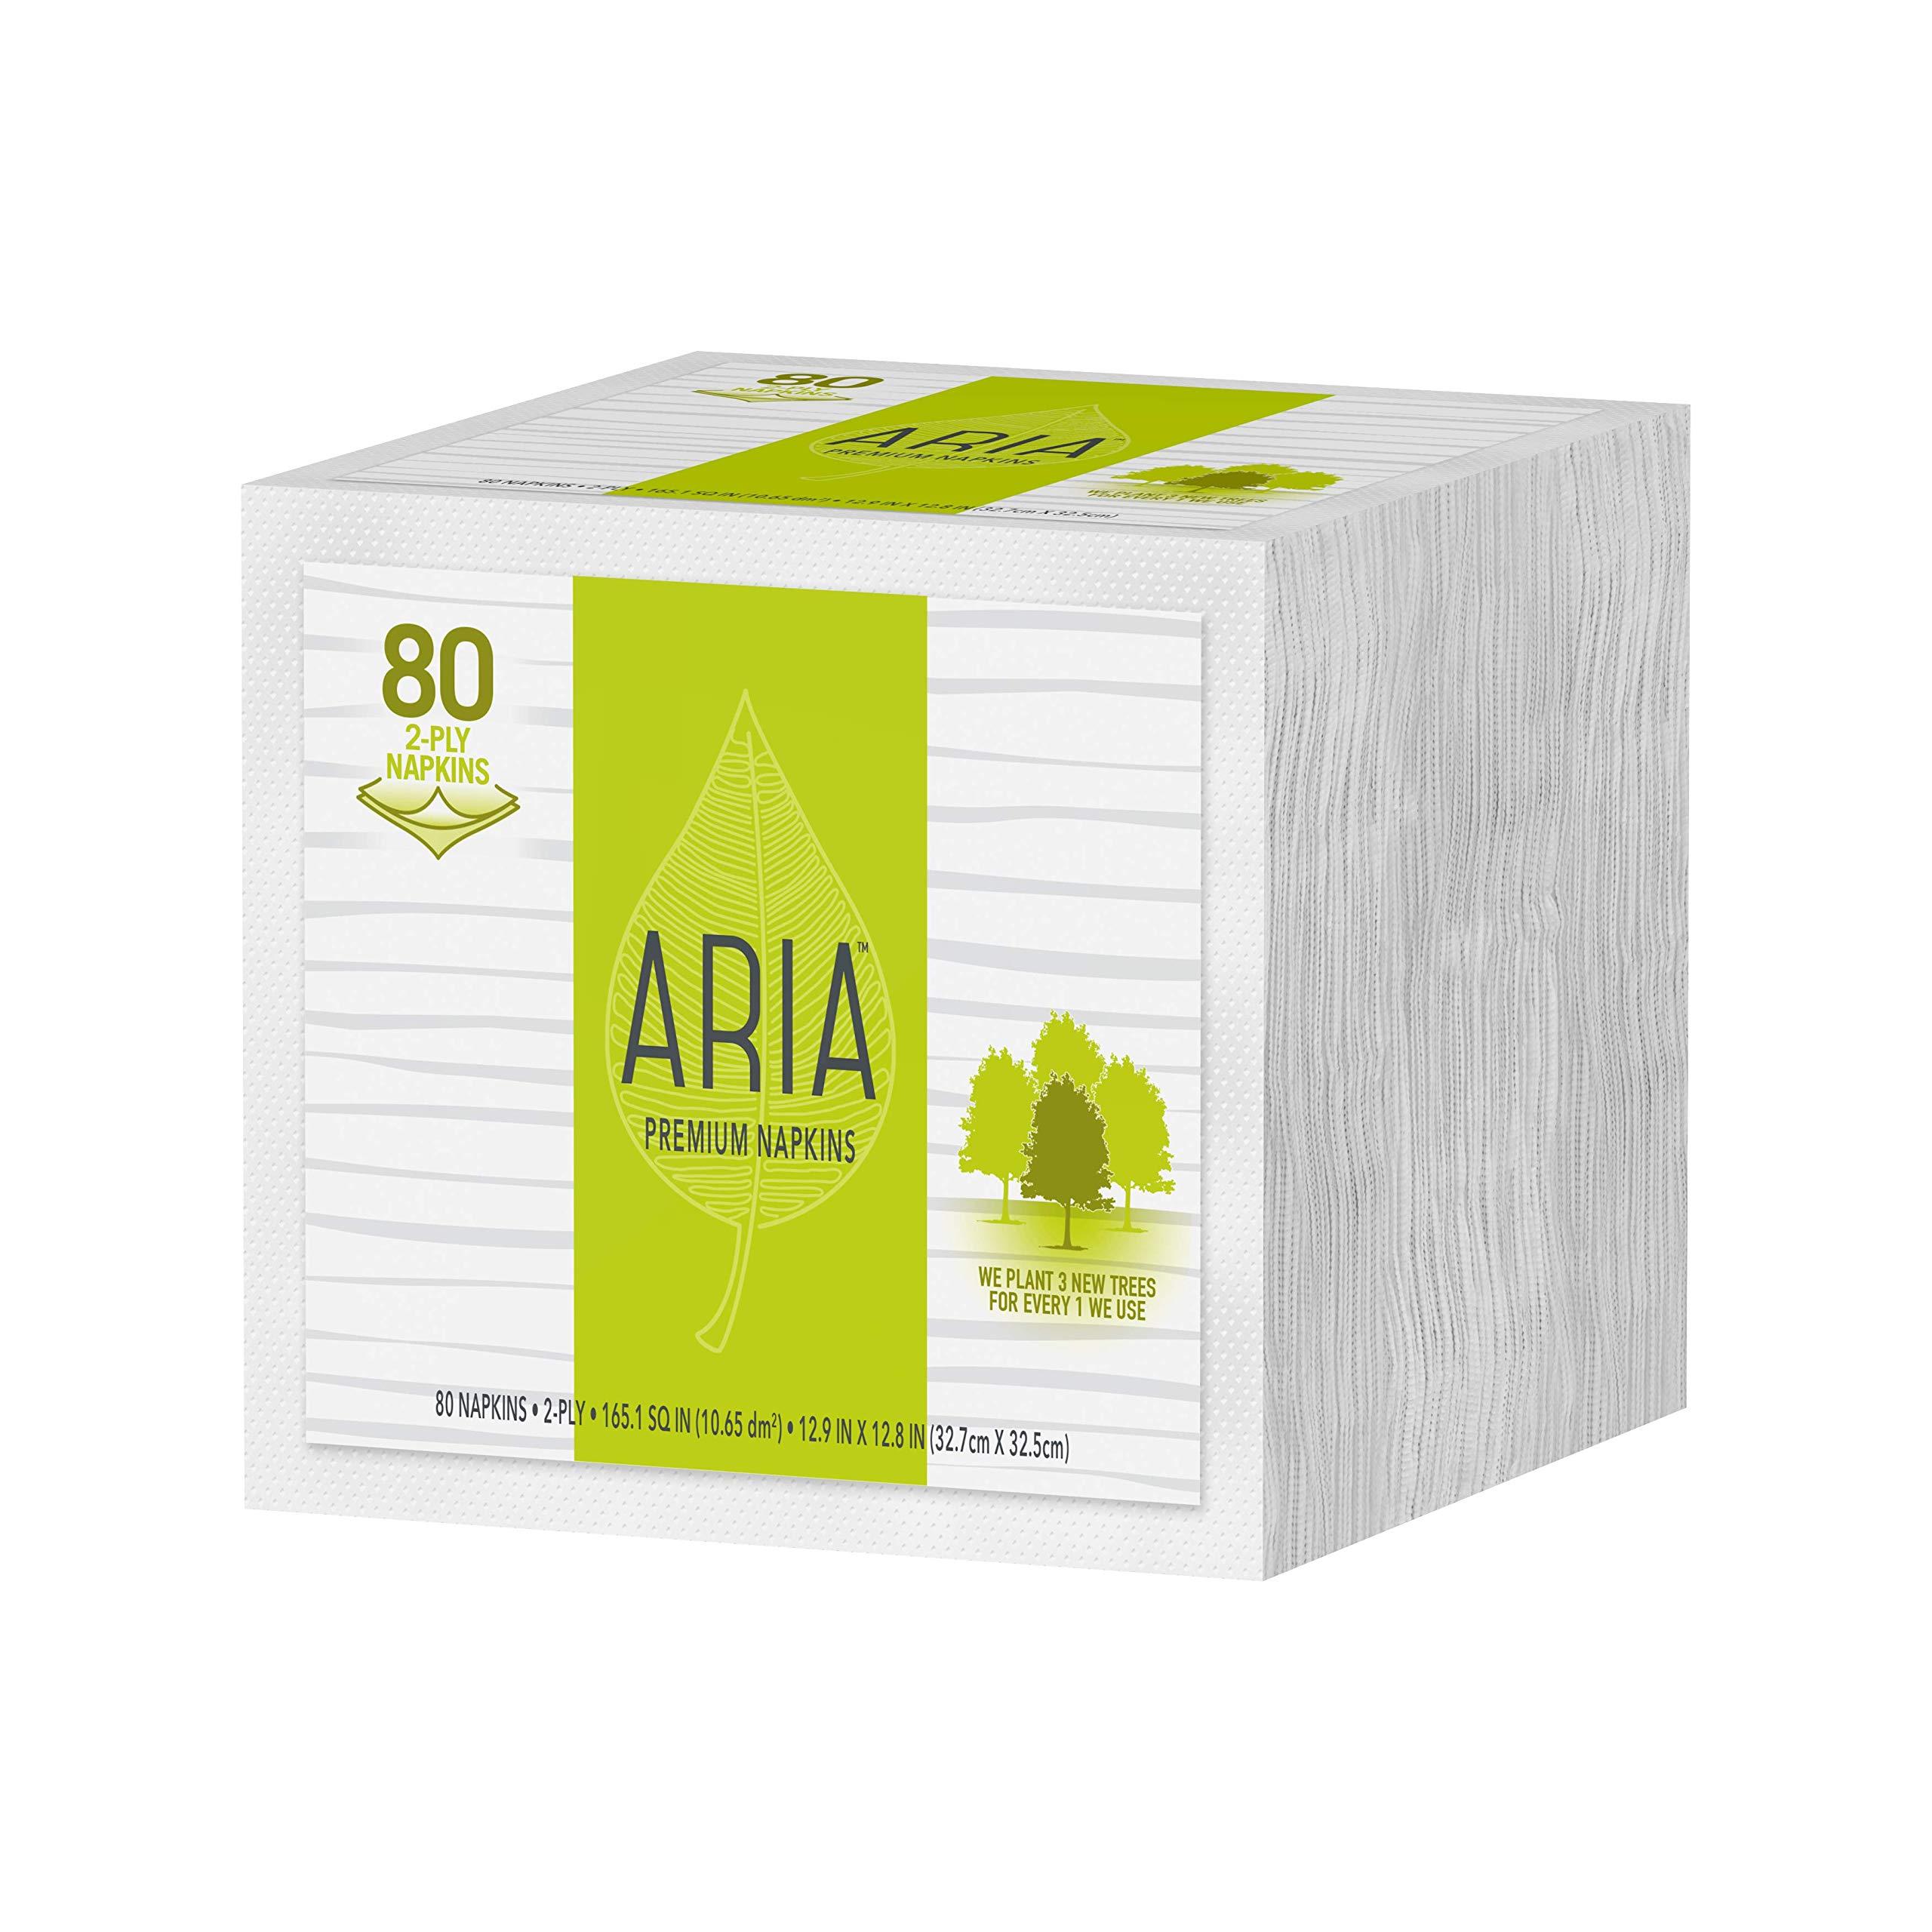 Aria Premium Earth Friendly Napkins, 80-Count 2-Ply Napkins, White, Paper, Eco Friendly Napkins